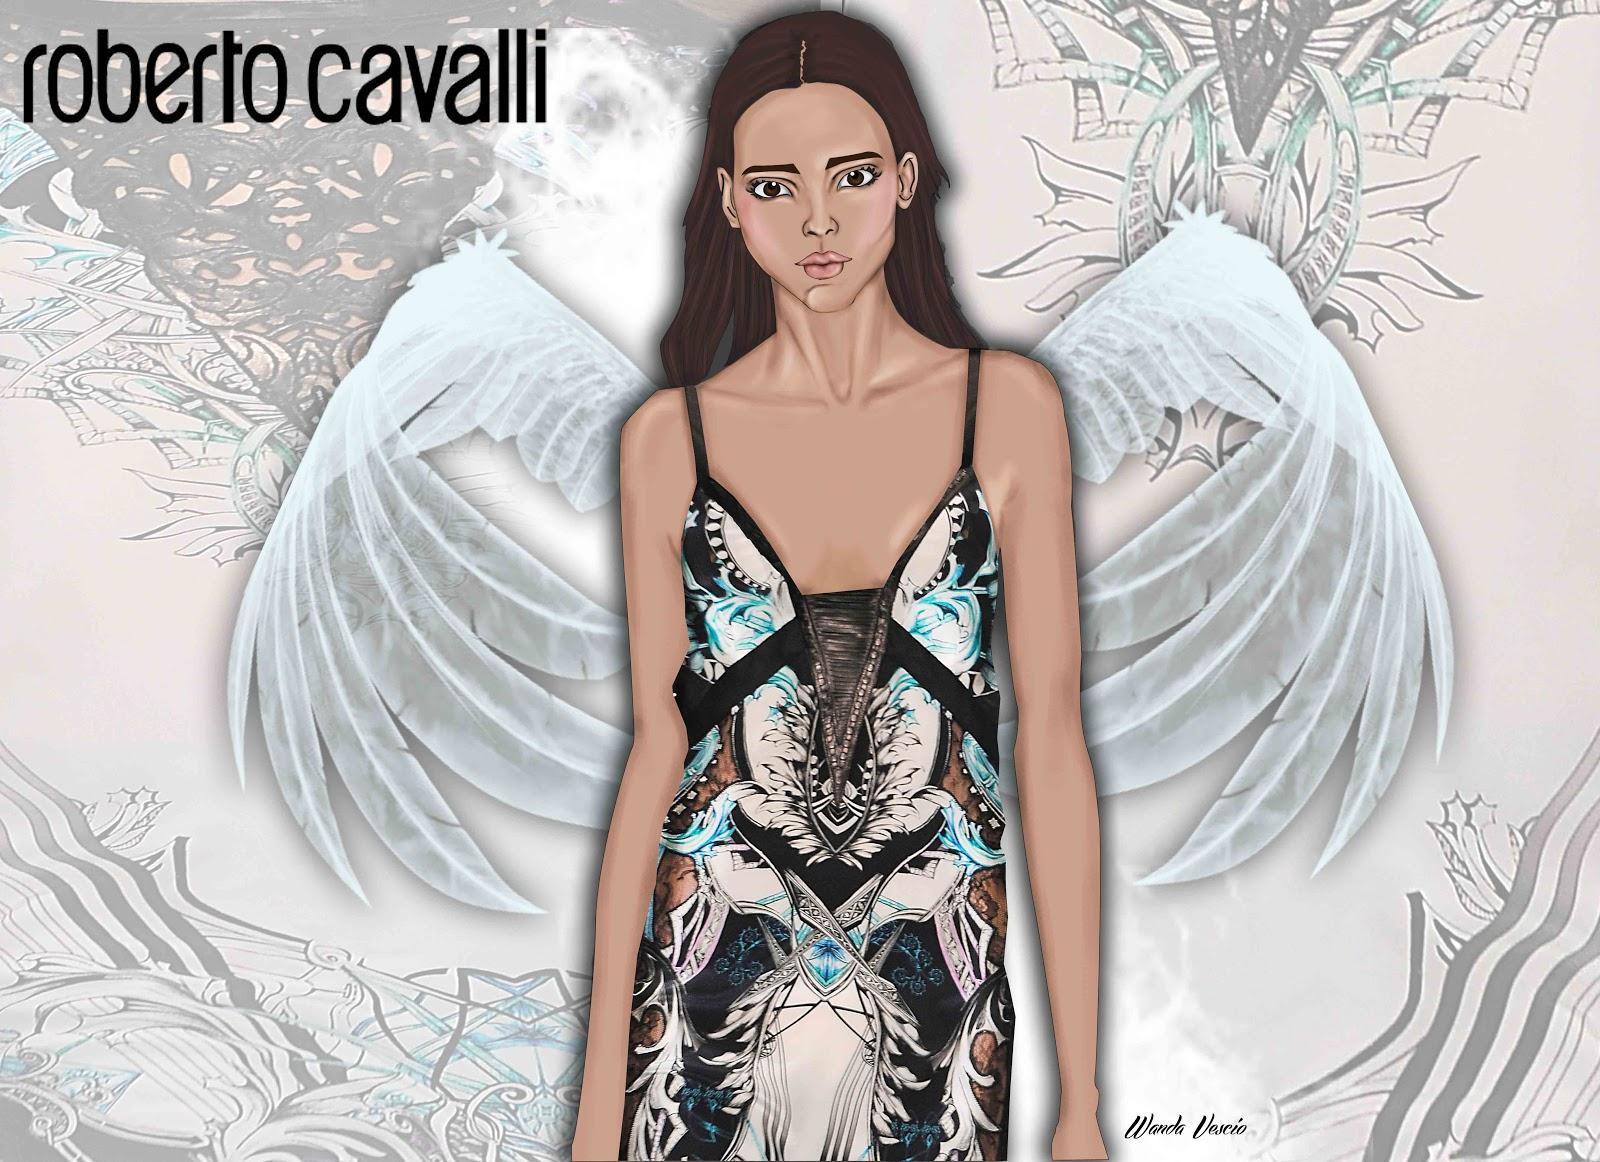 Roberto Cavalli sketch